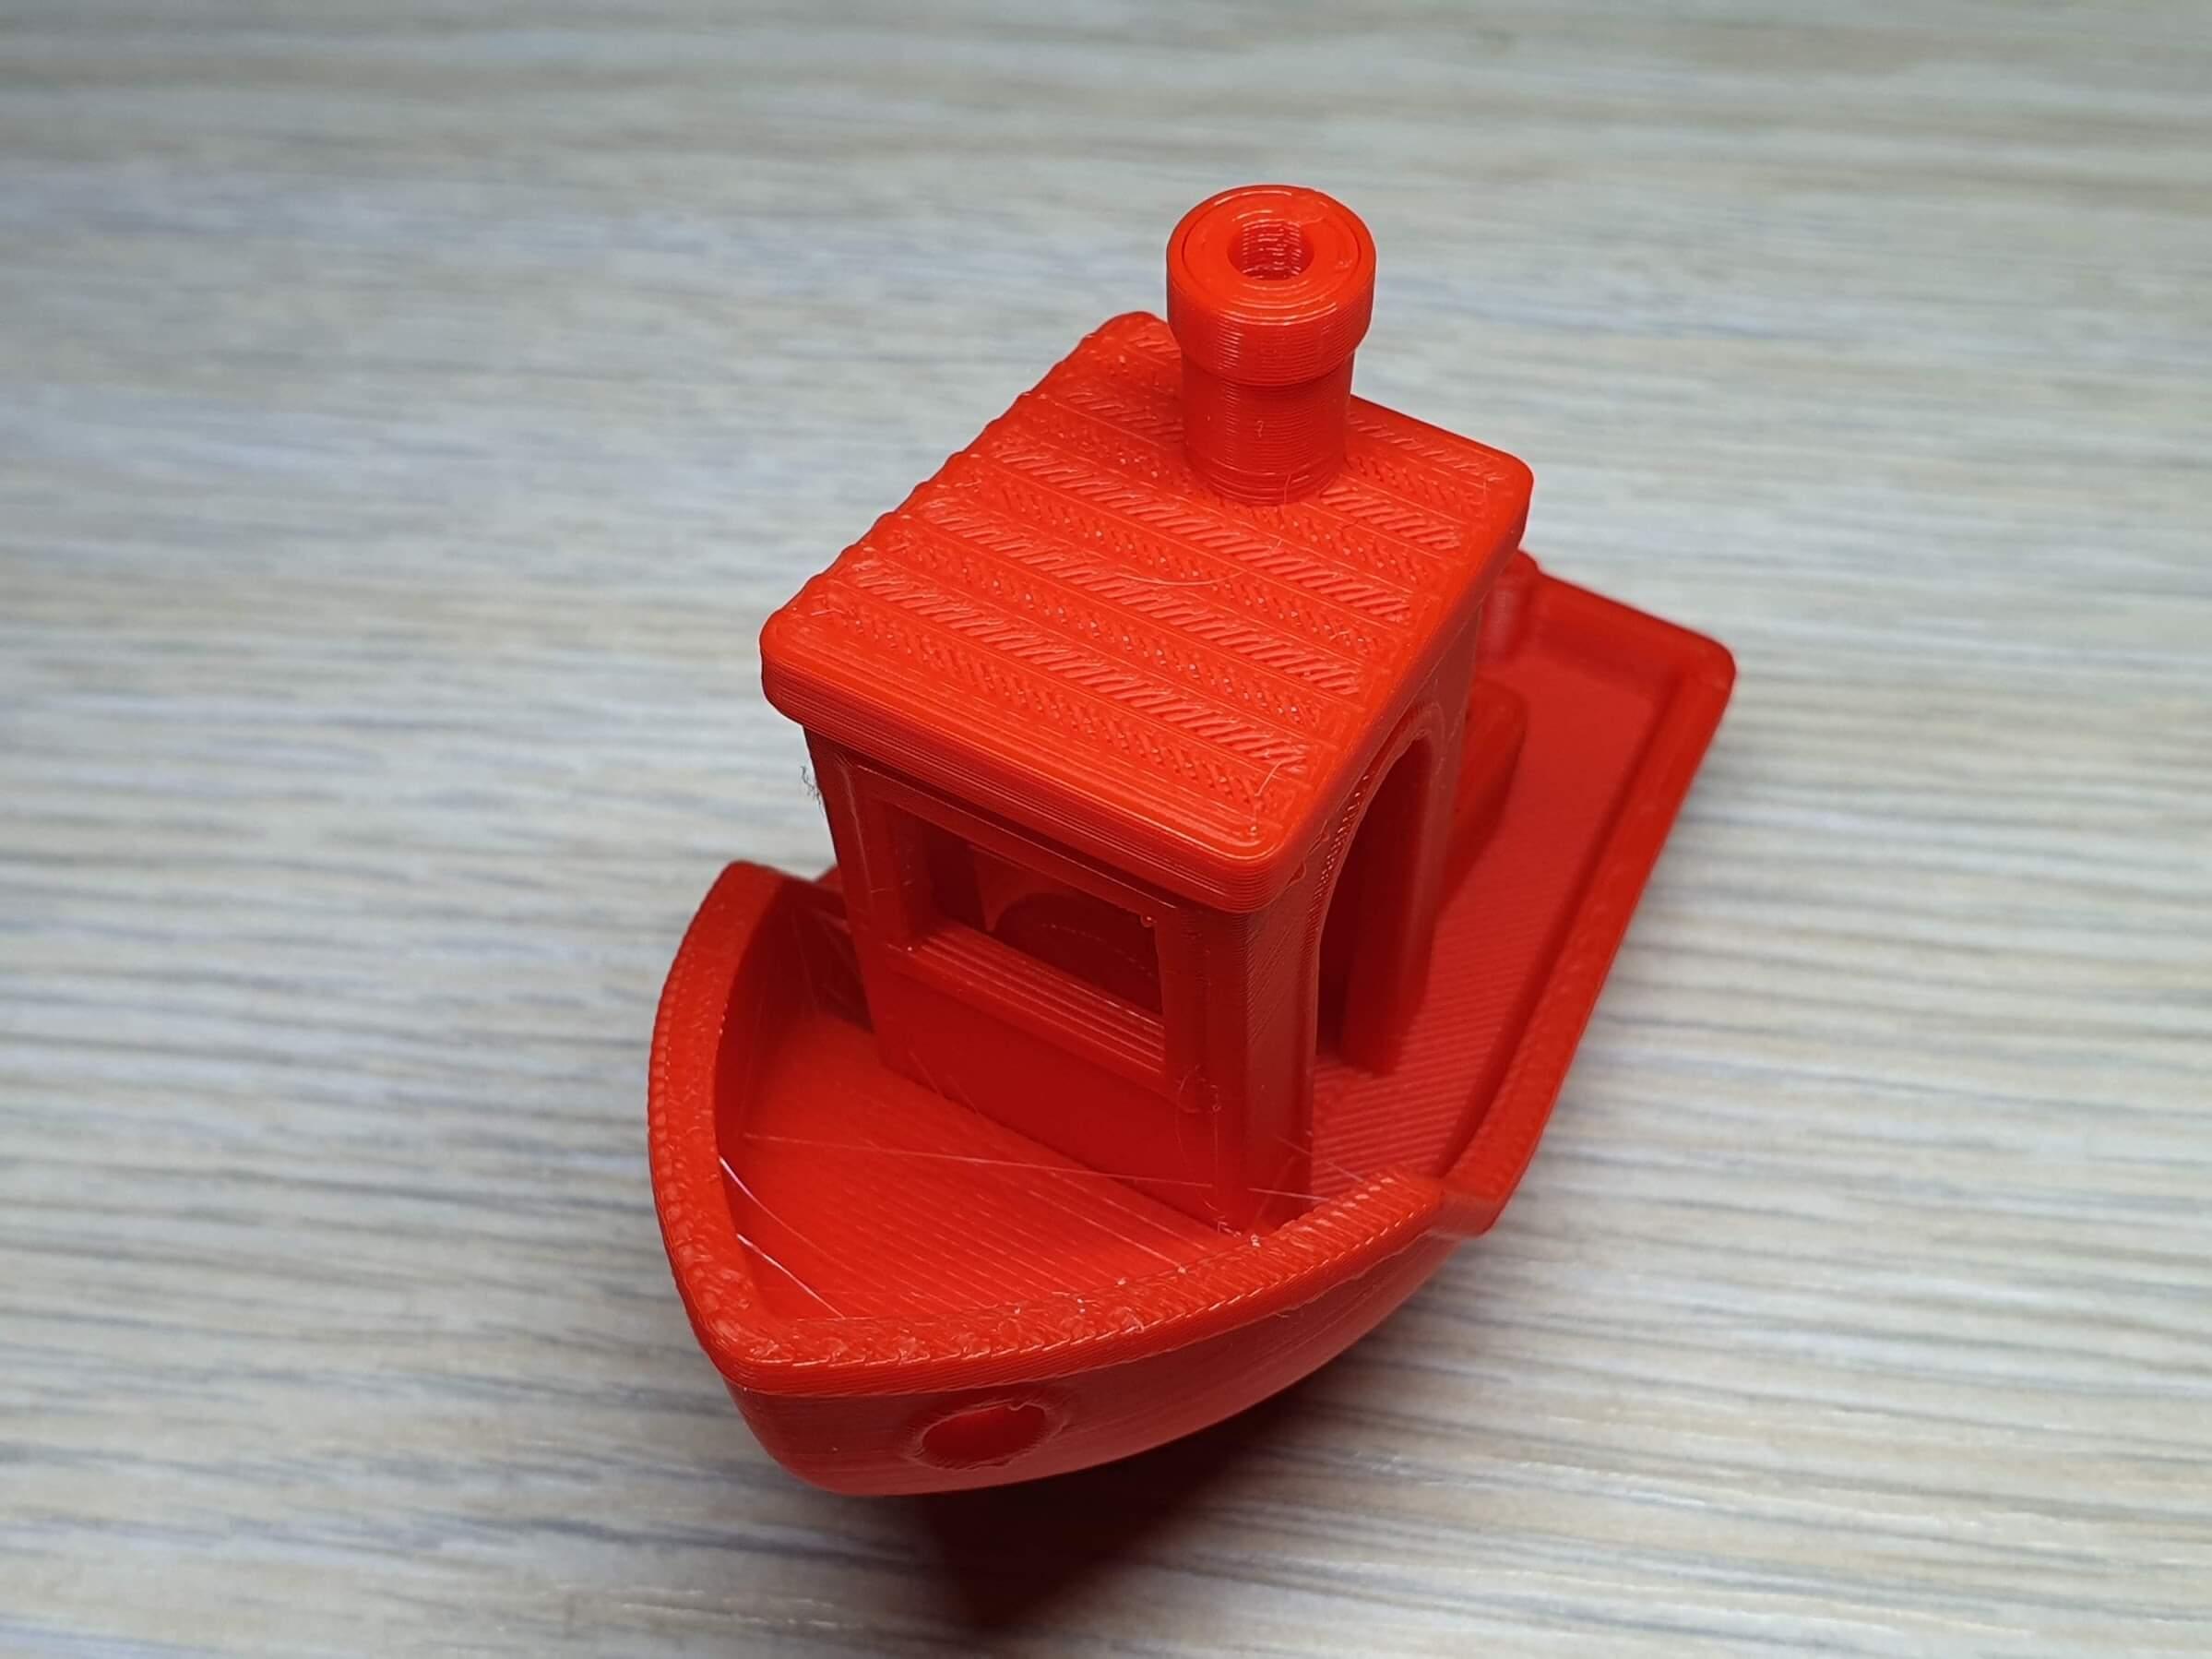 BIQU-B1-3D-Benchy-print-test-6